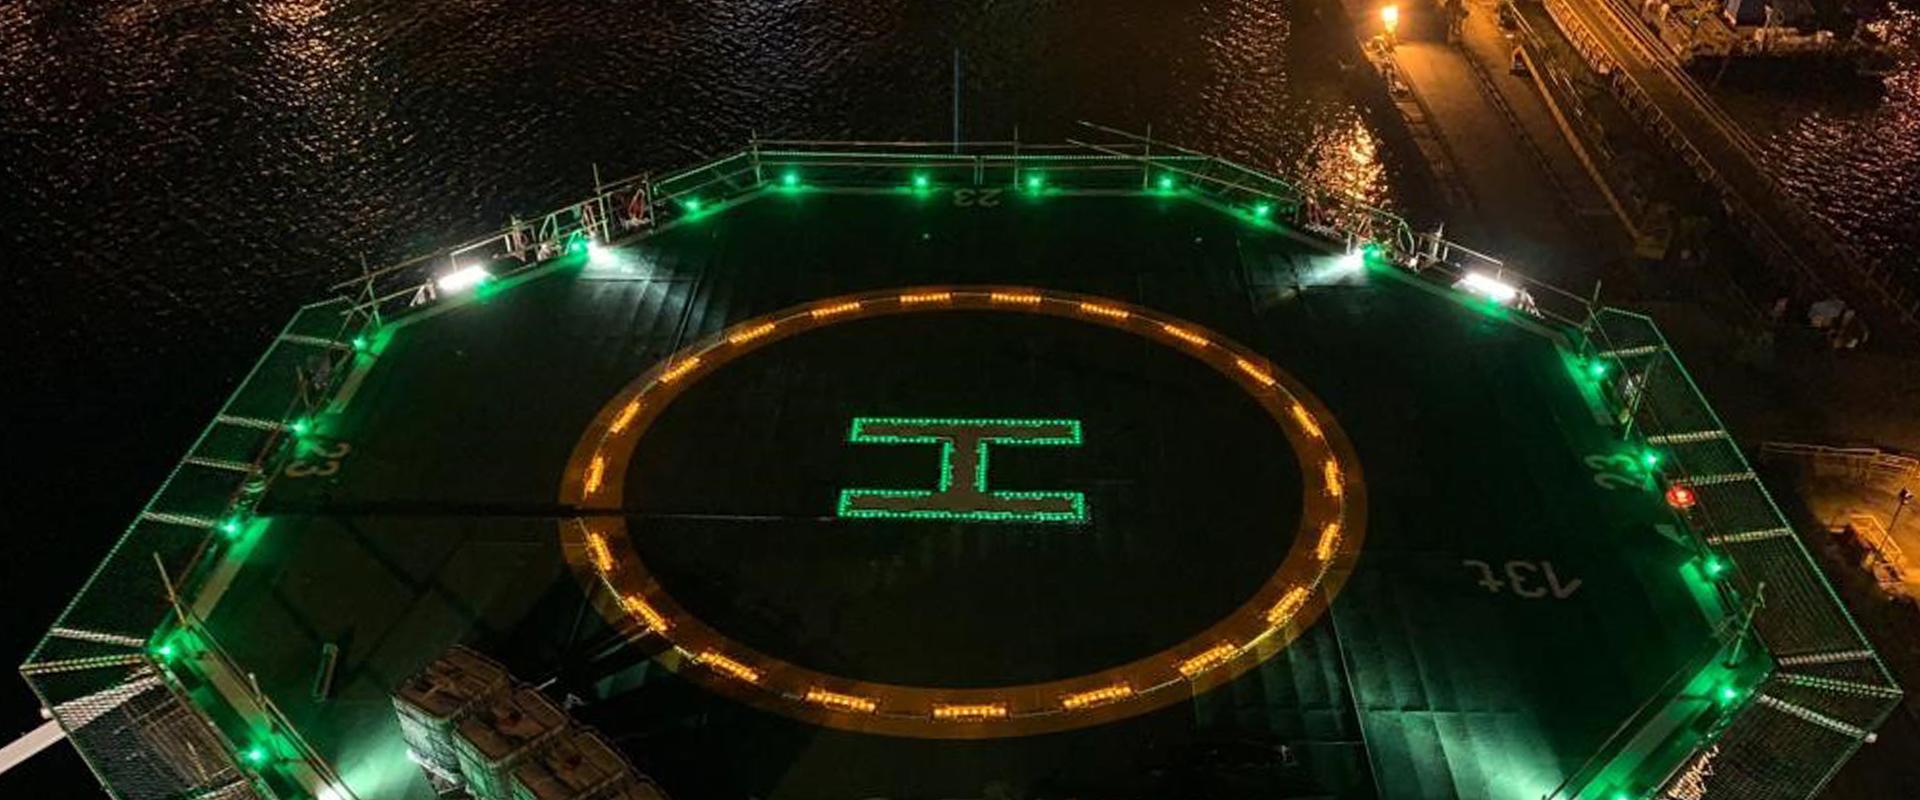 Adipec 2018 news about circle-h